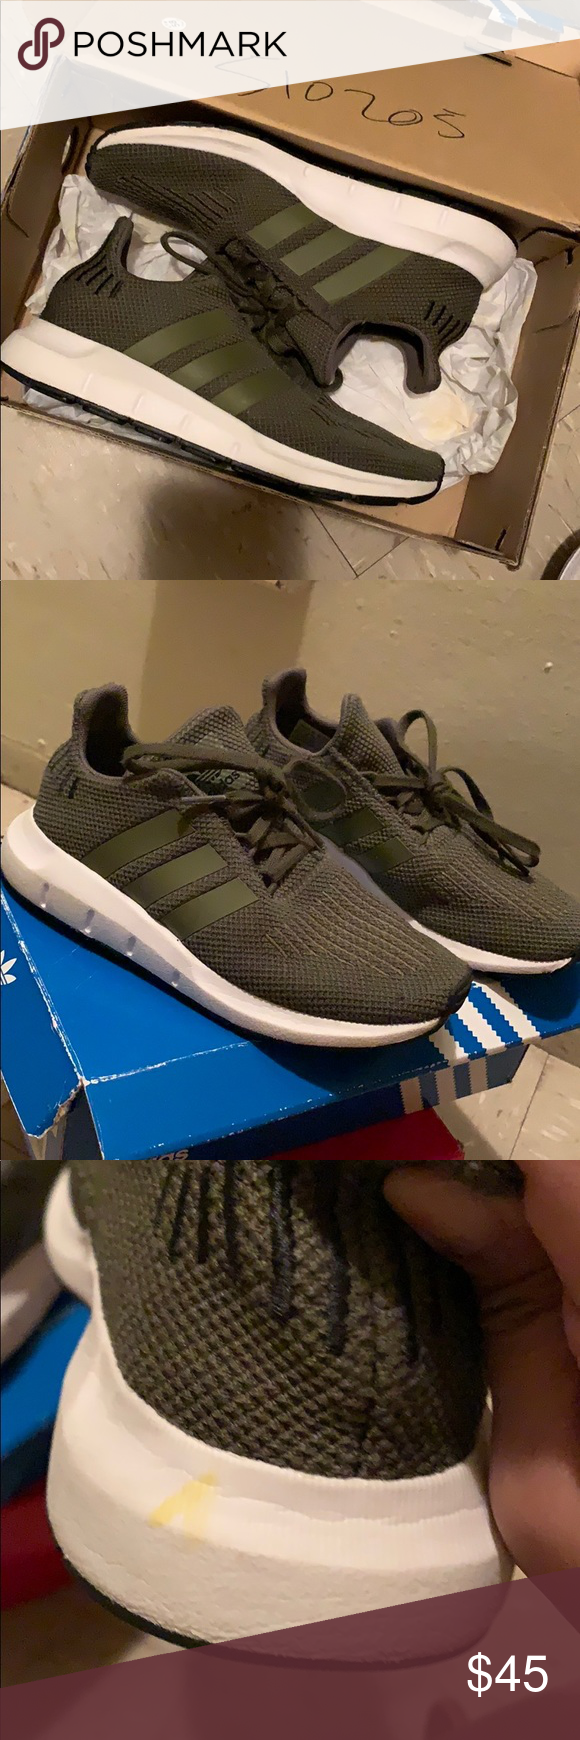 Brand new Adidas Swift Run gym shoes NWT